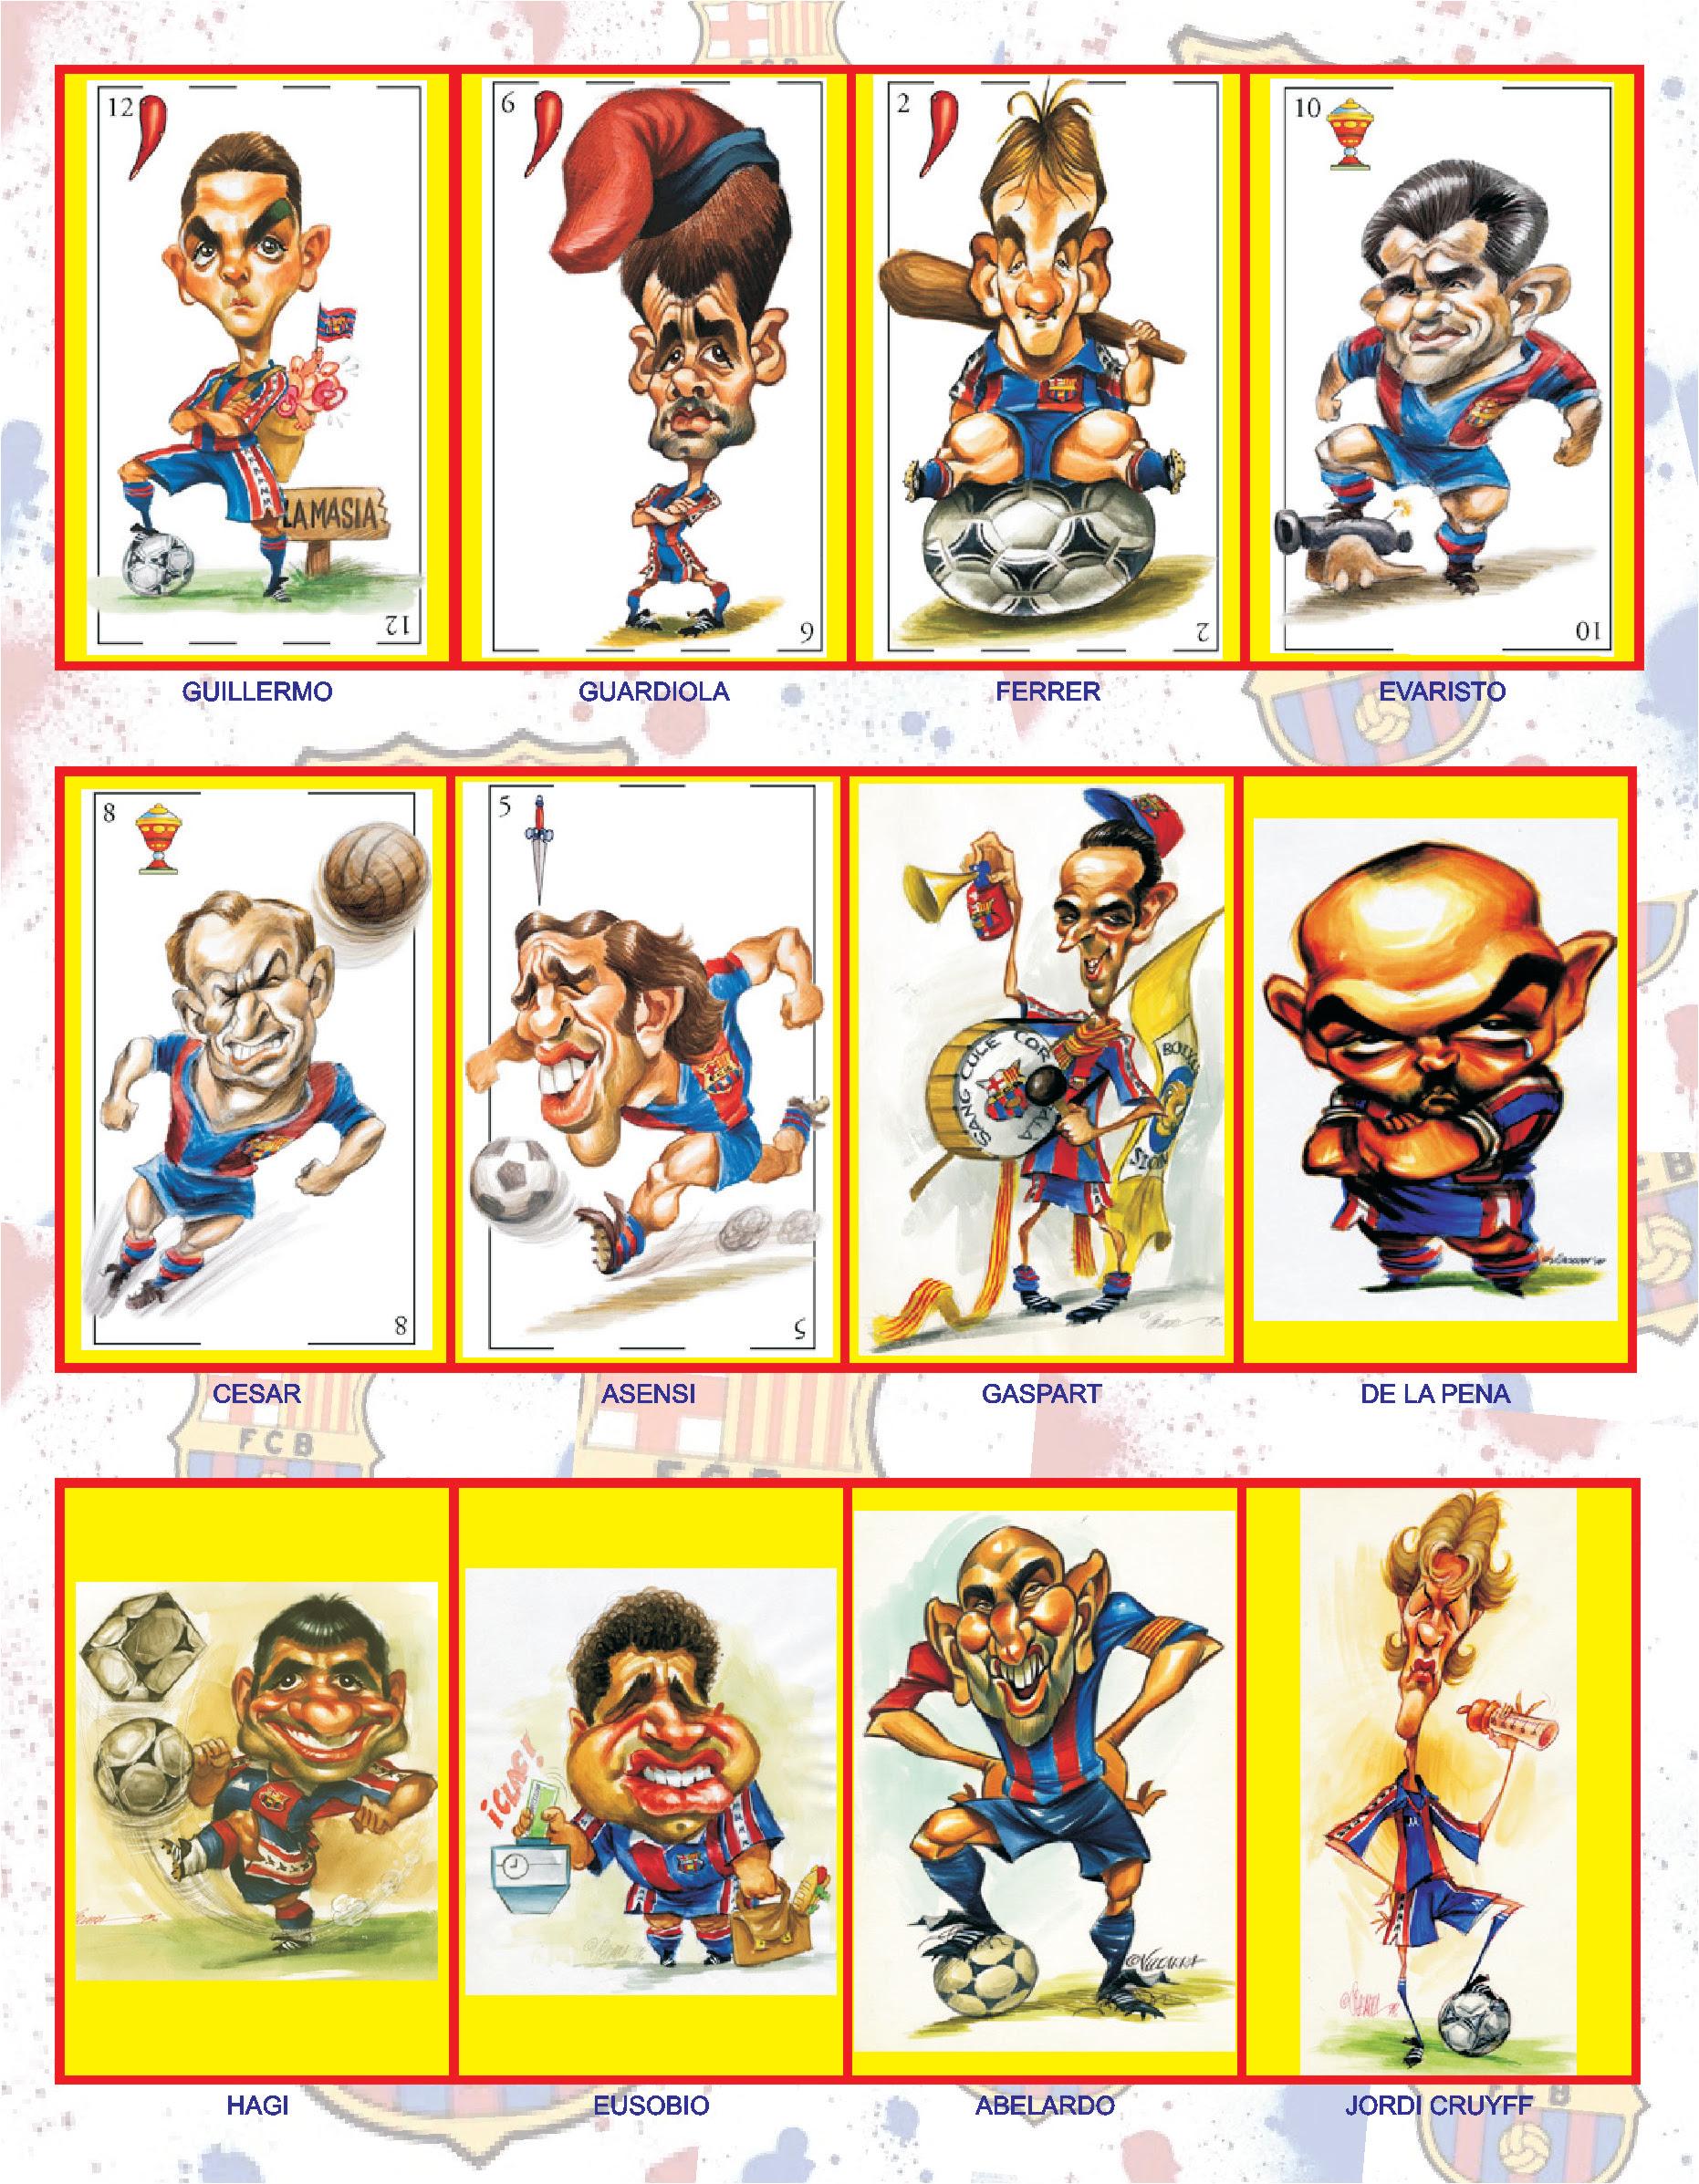 32 Gambar Karikatur Pemain Bola Indonesia